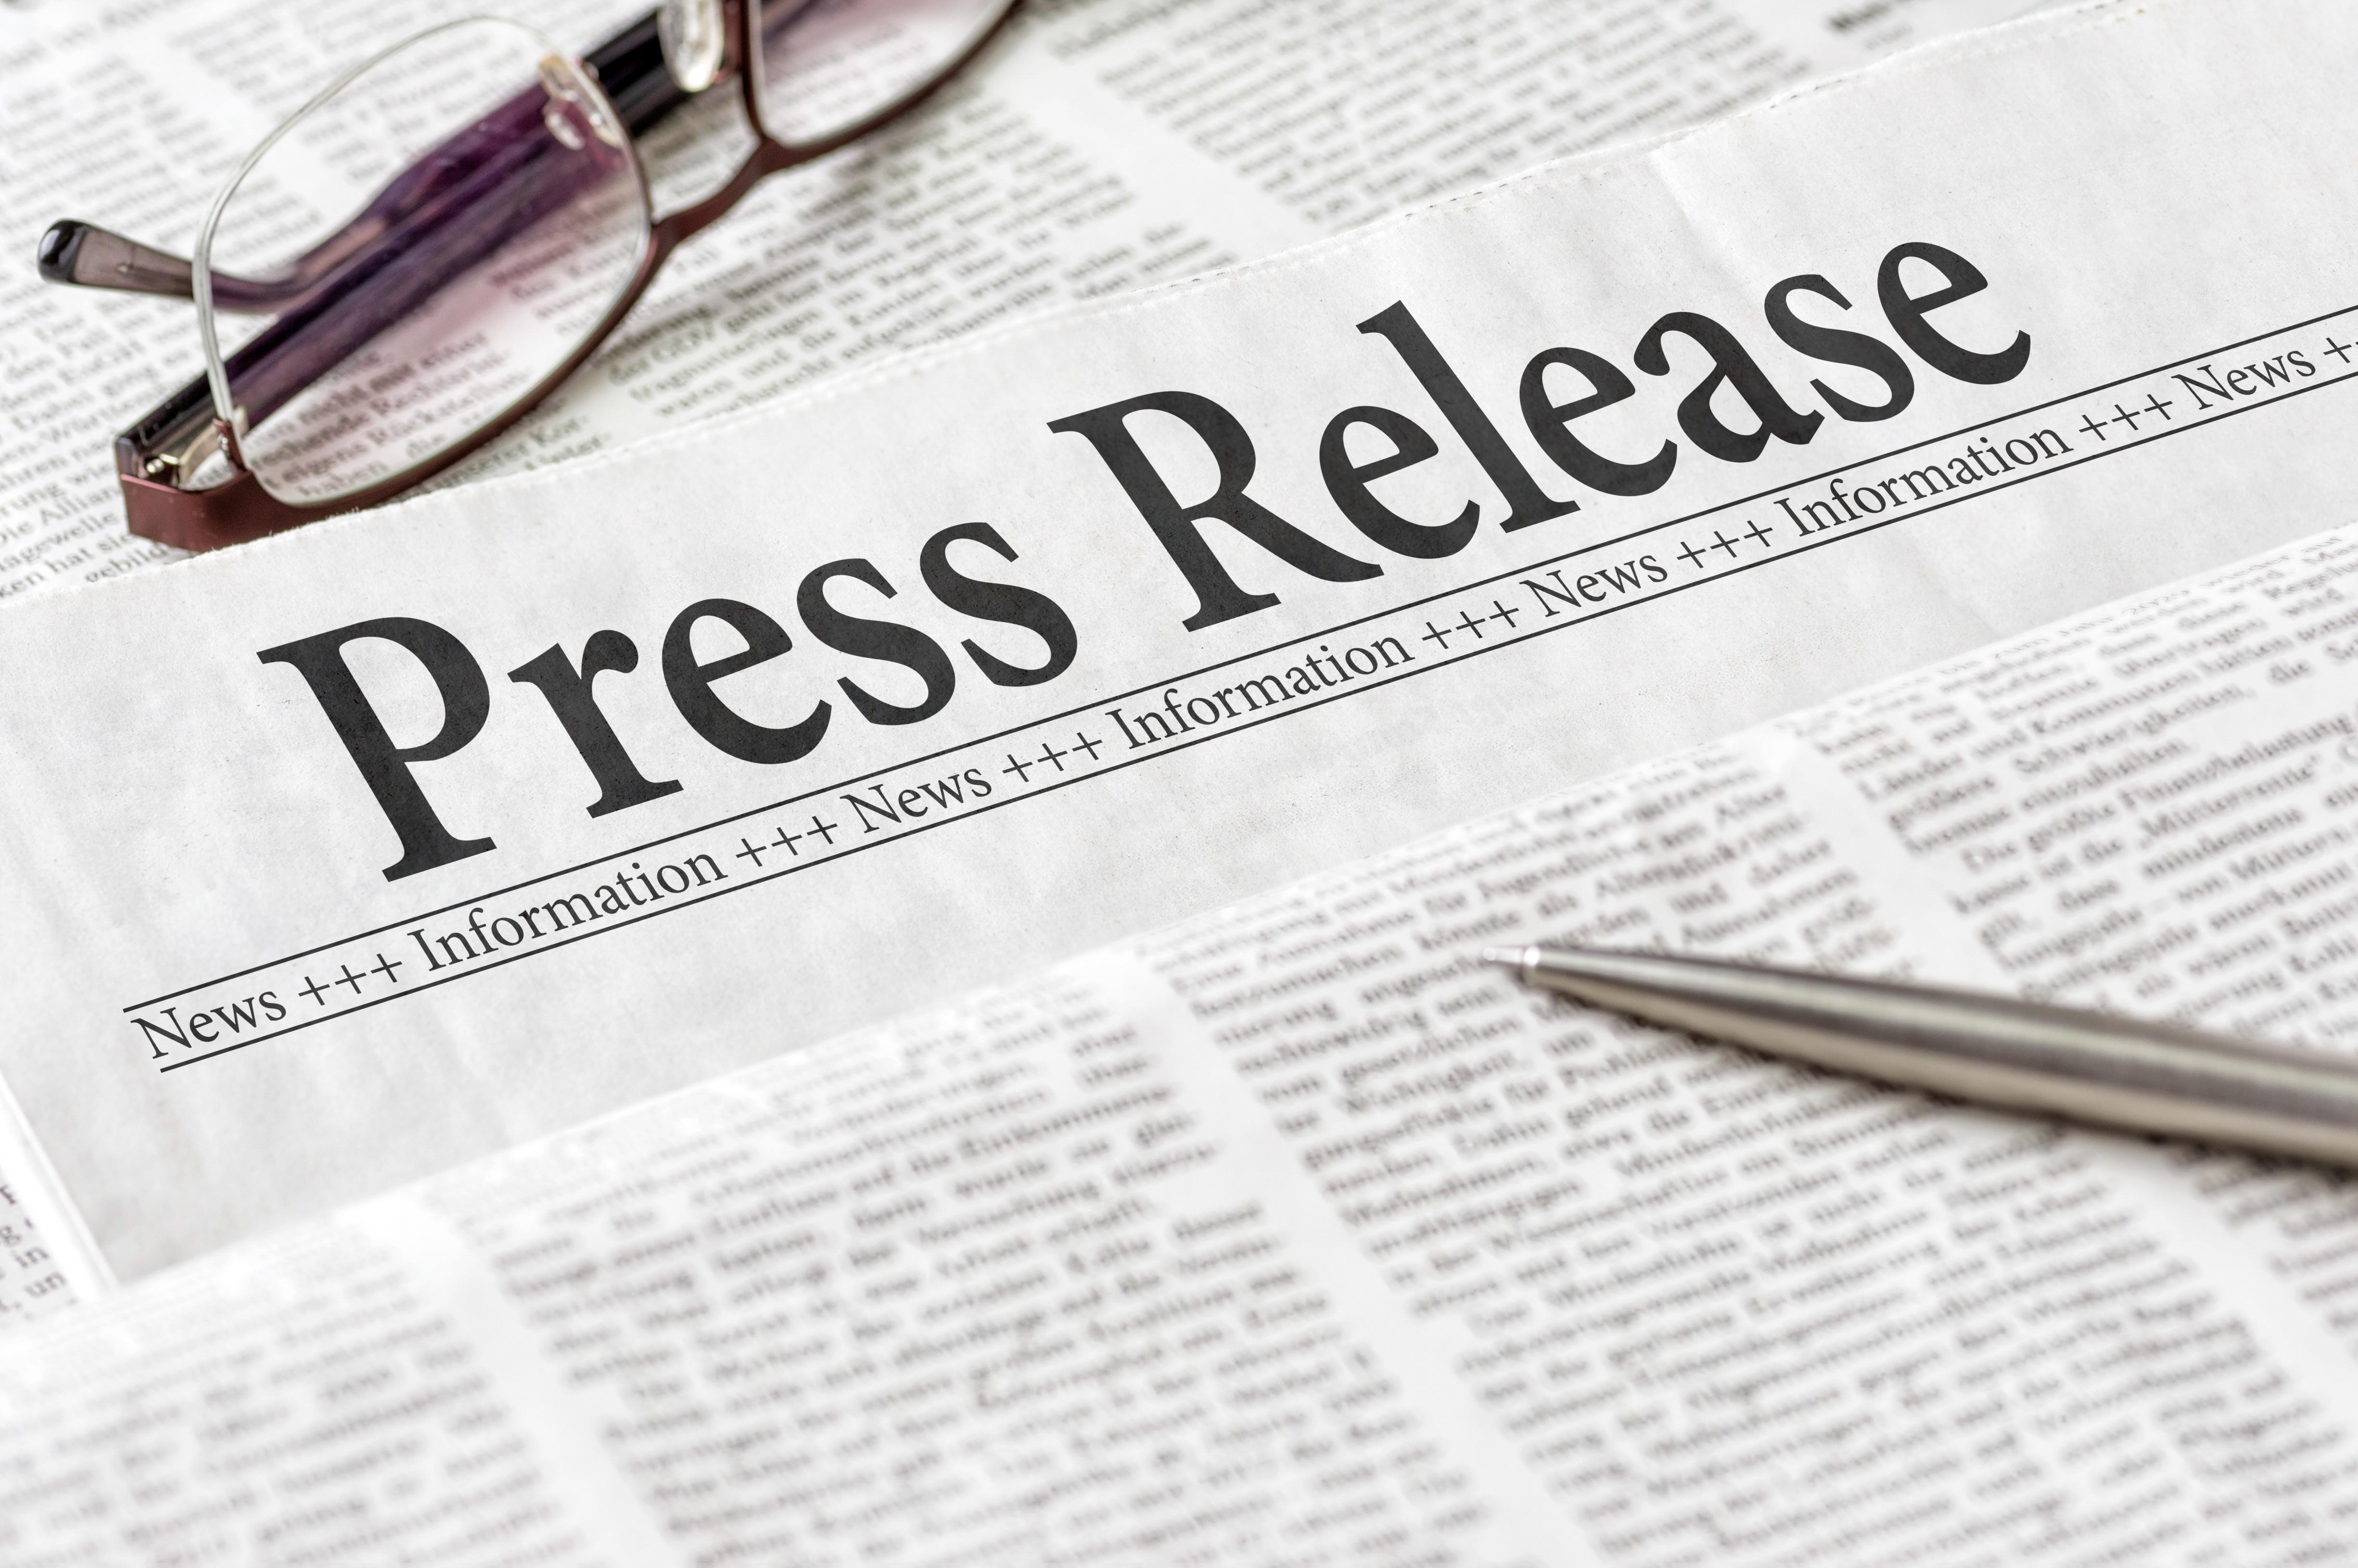 Press Release.jpeg